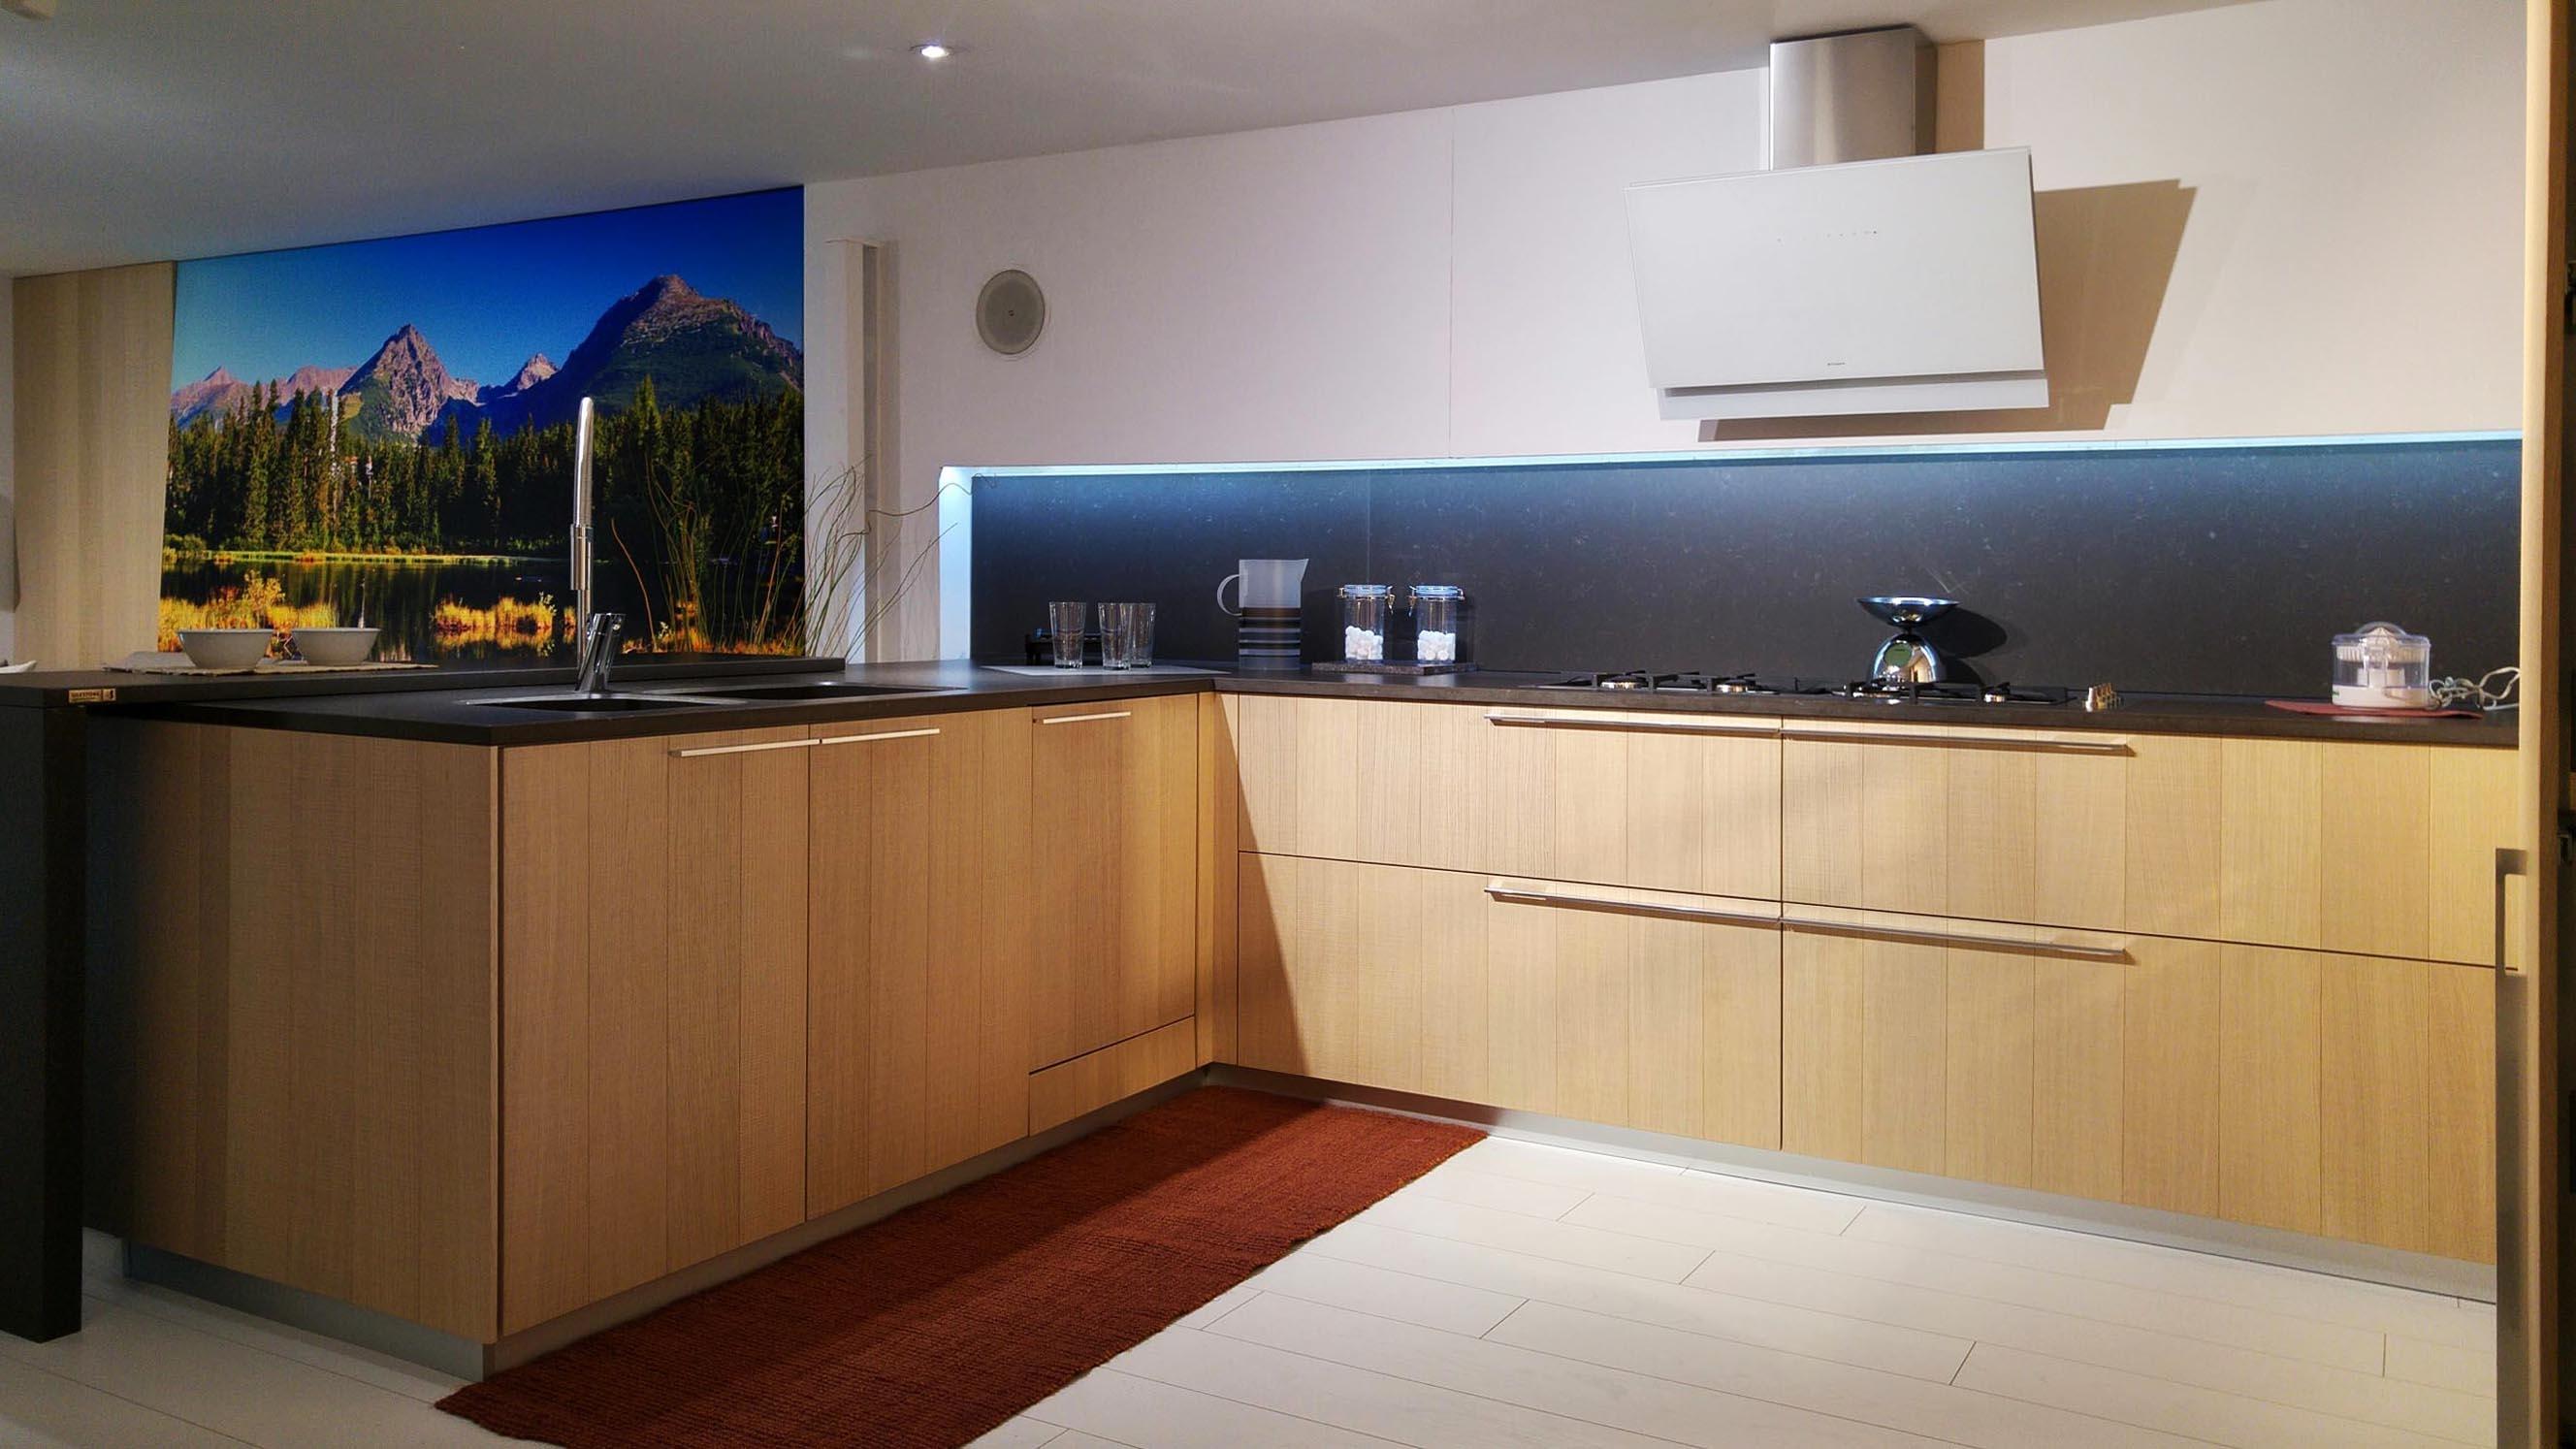 Cucina cesar kalea design legno cucine a prezzi scontati - Cucine cesar prezzi ...